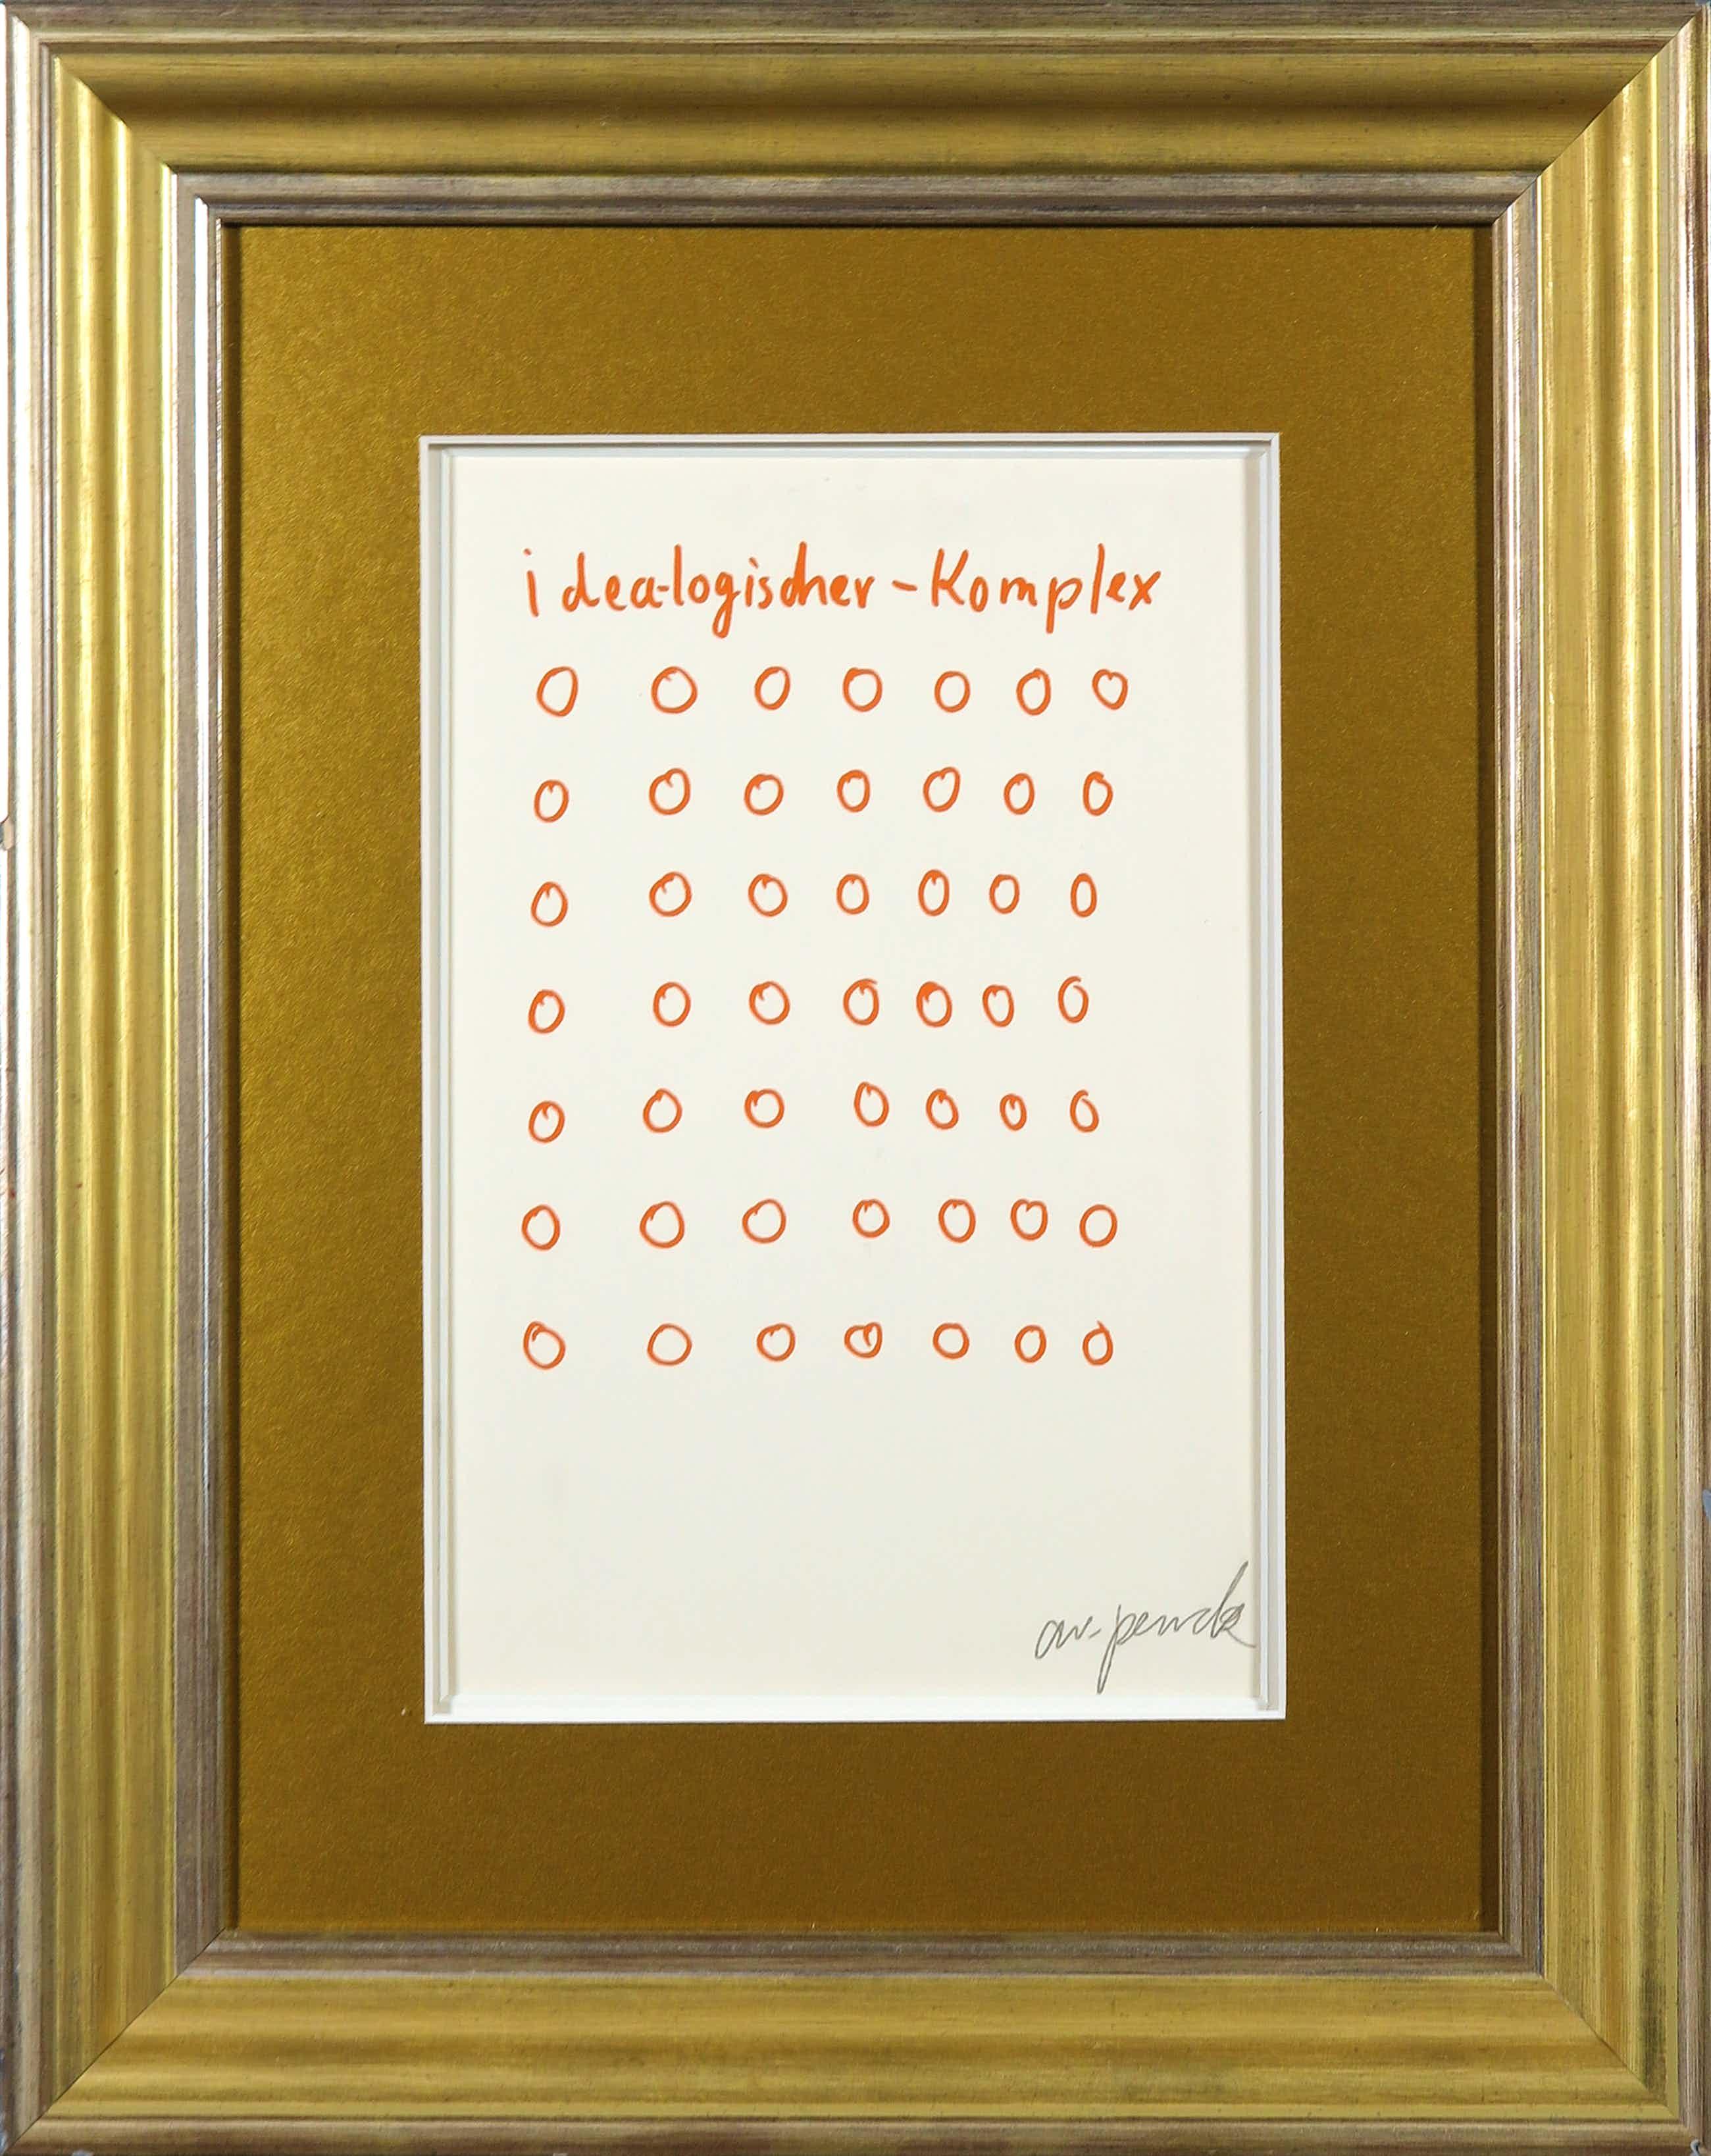 A.R. Penck - Zeldzame, handgesigneerde litho, Idea-logischer-Komplex kopen? Bied vanaf 190!